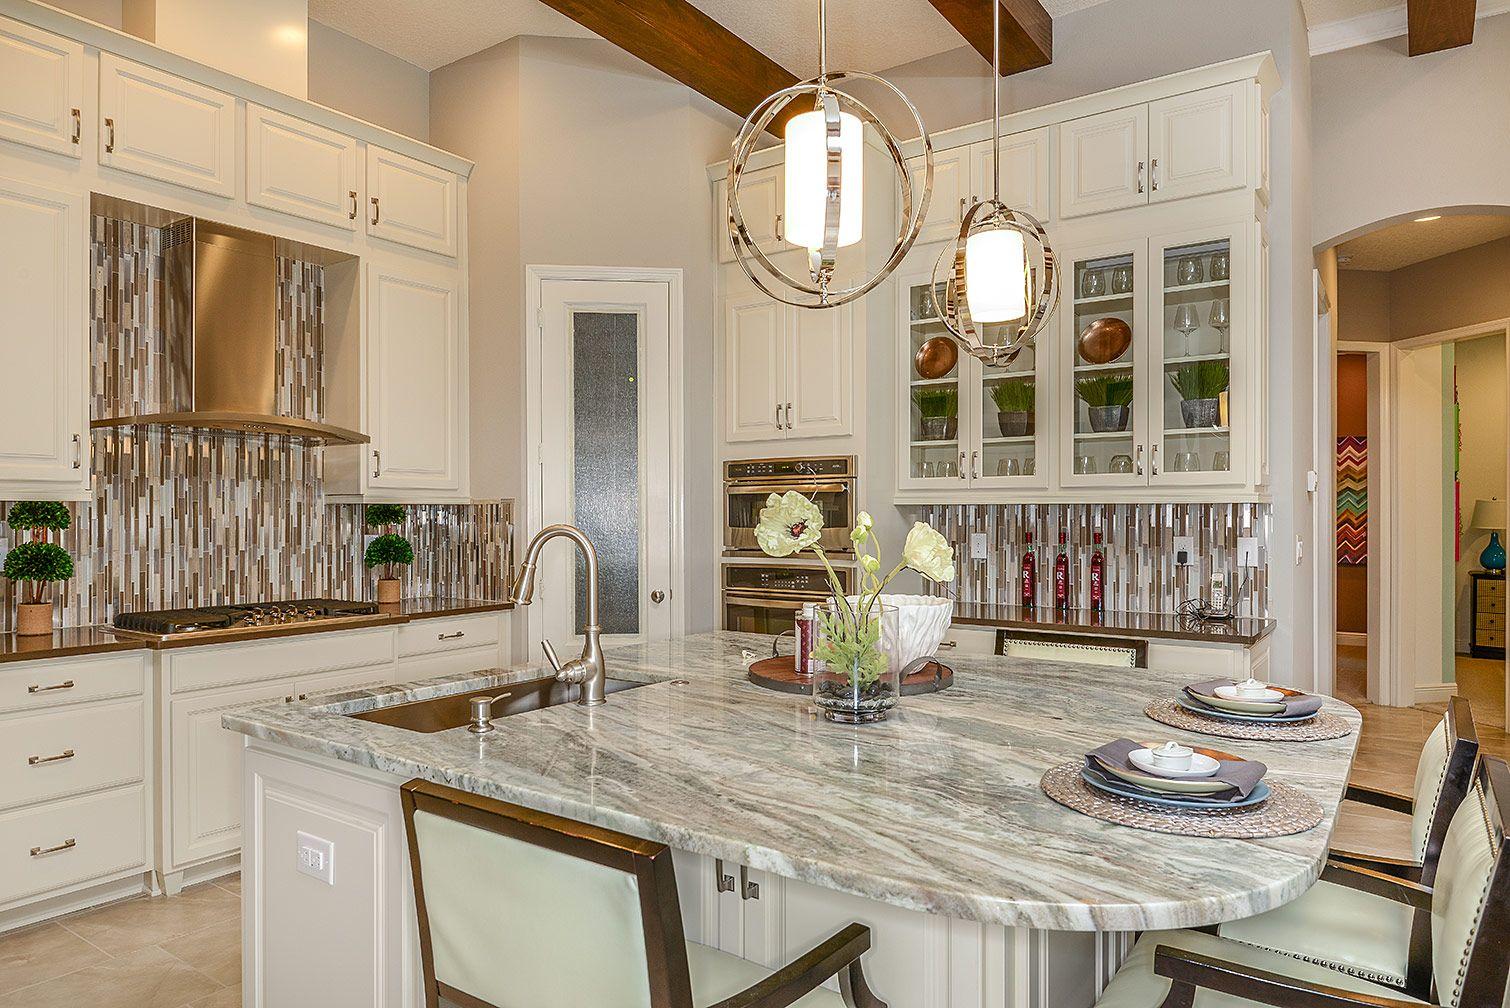 Homes By Westbay Key Largo White Kitchen Cabinets Kitchen Design Home